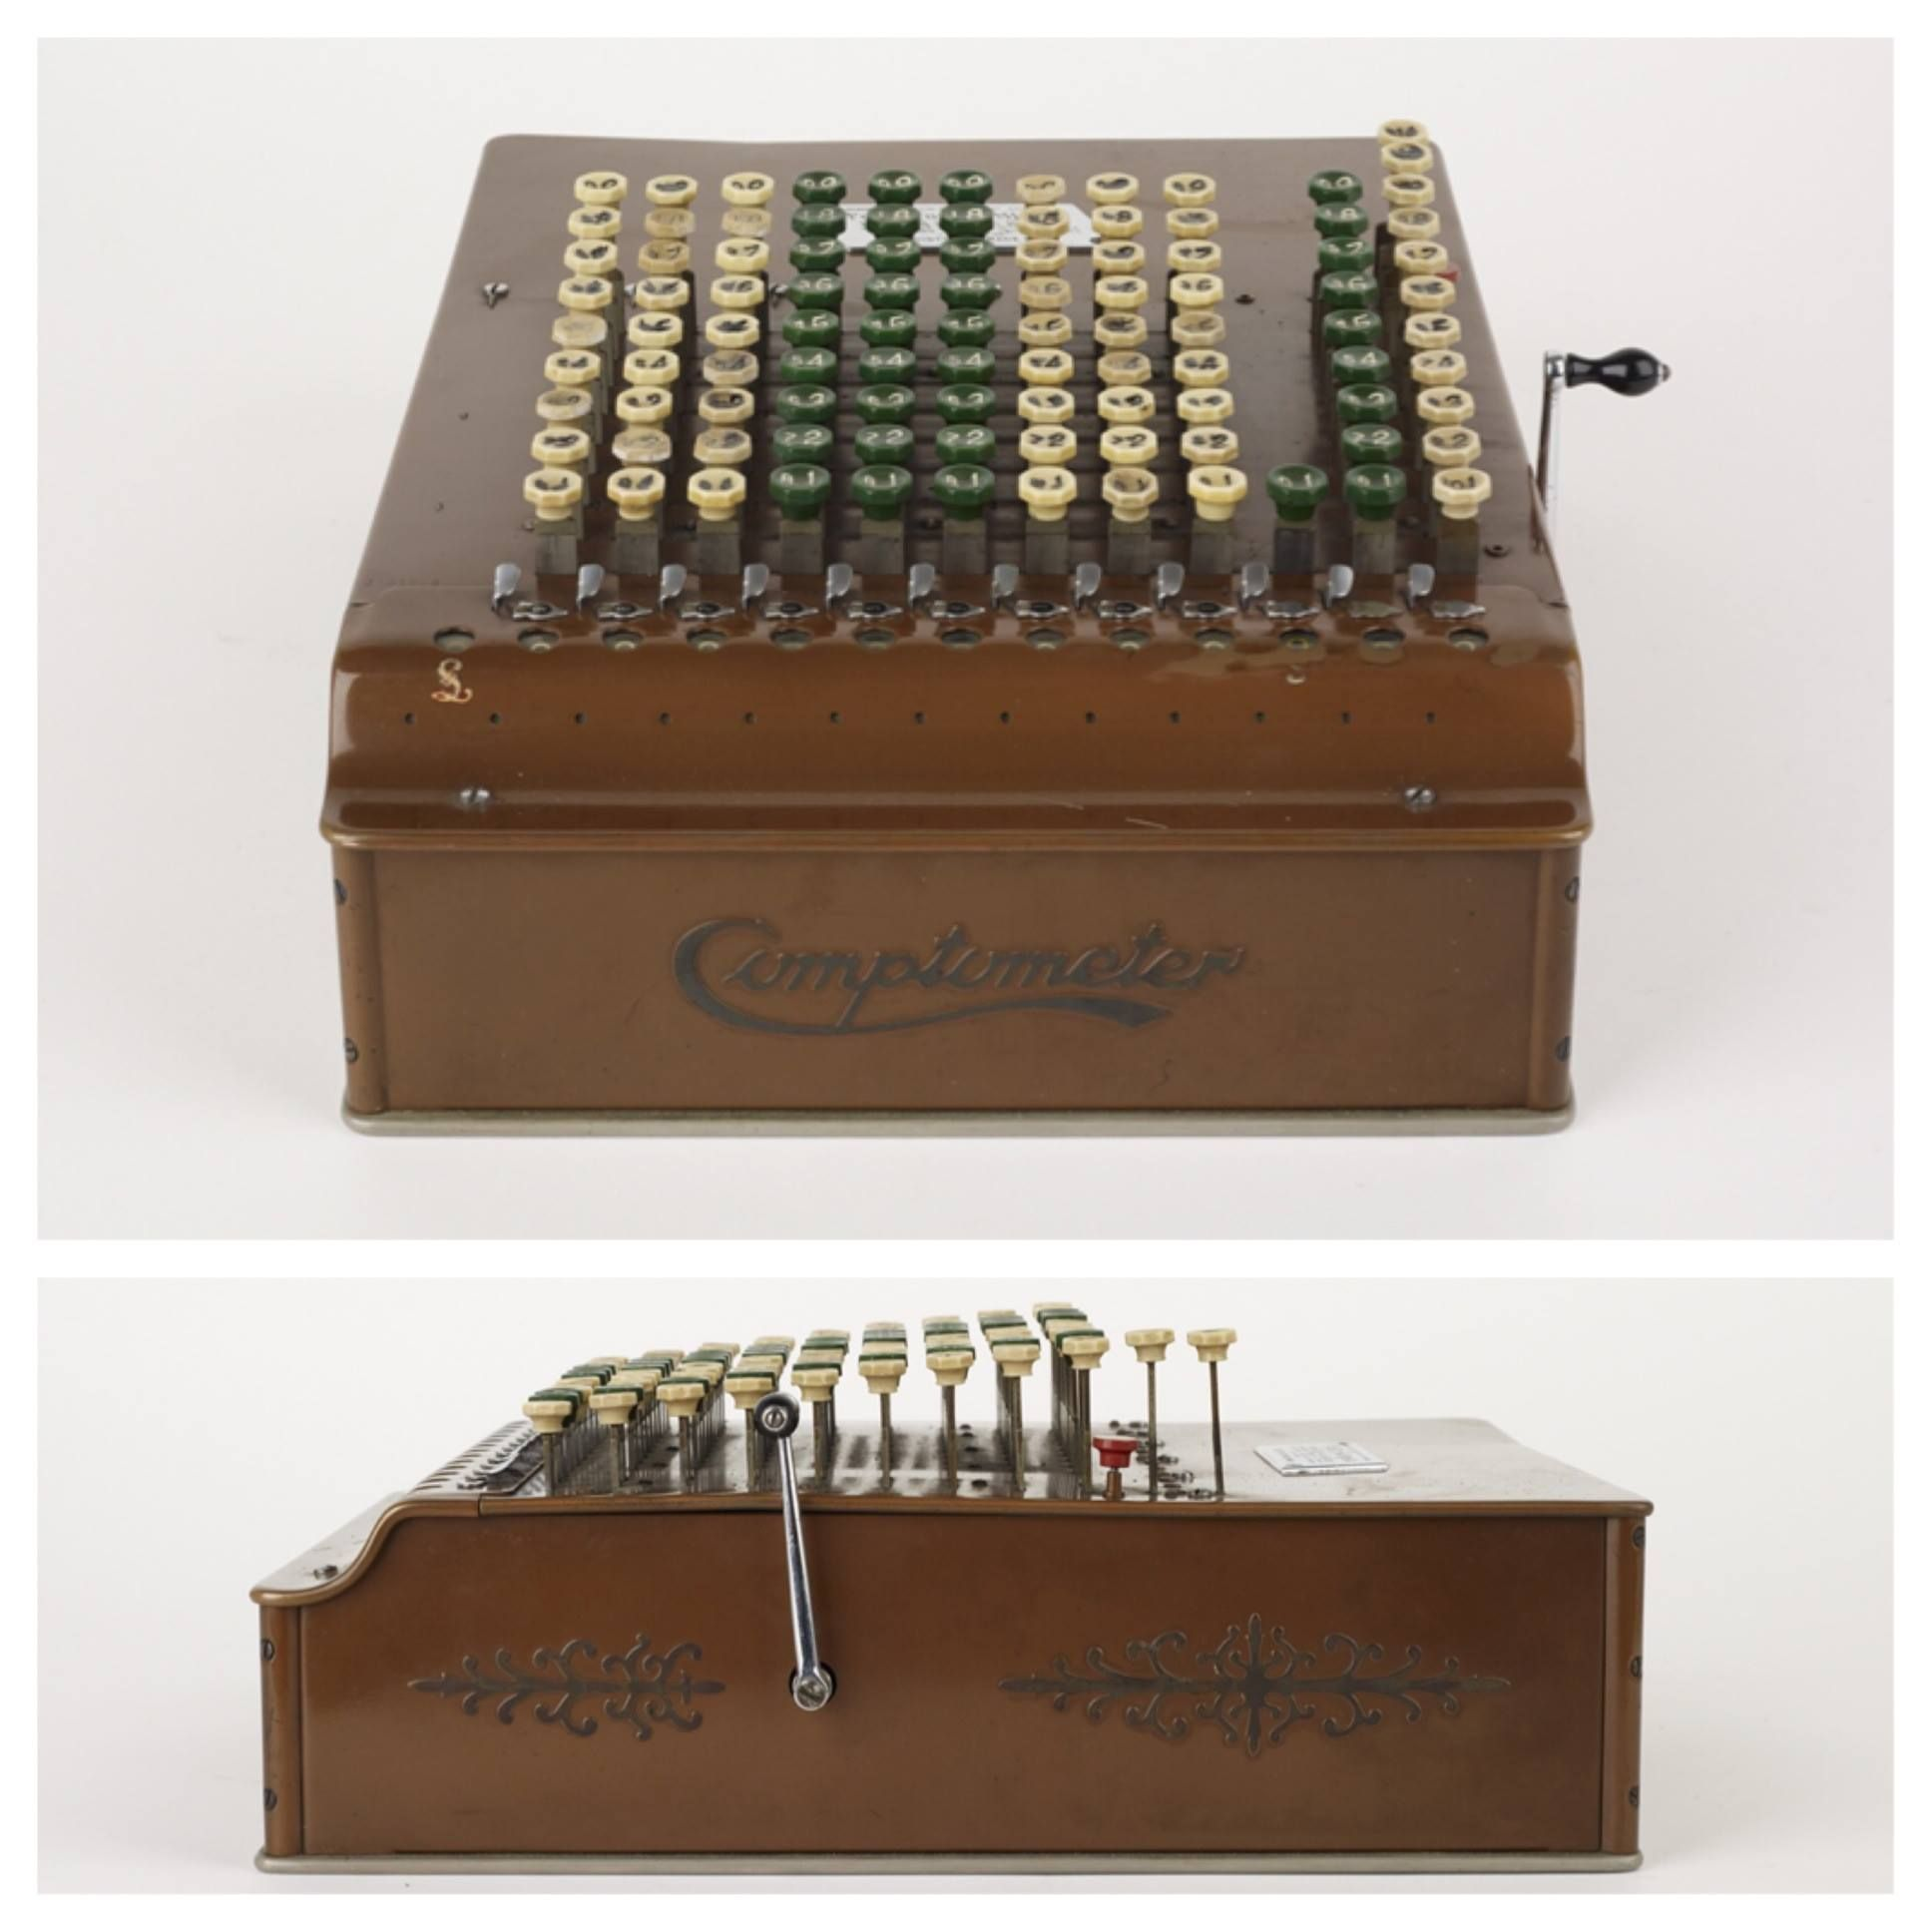 Comptometer Calculating Machine C 1914 Manufactured By Felt